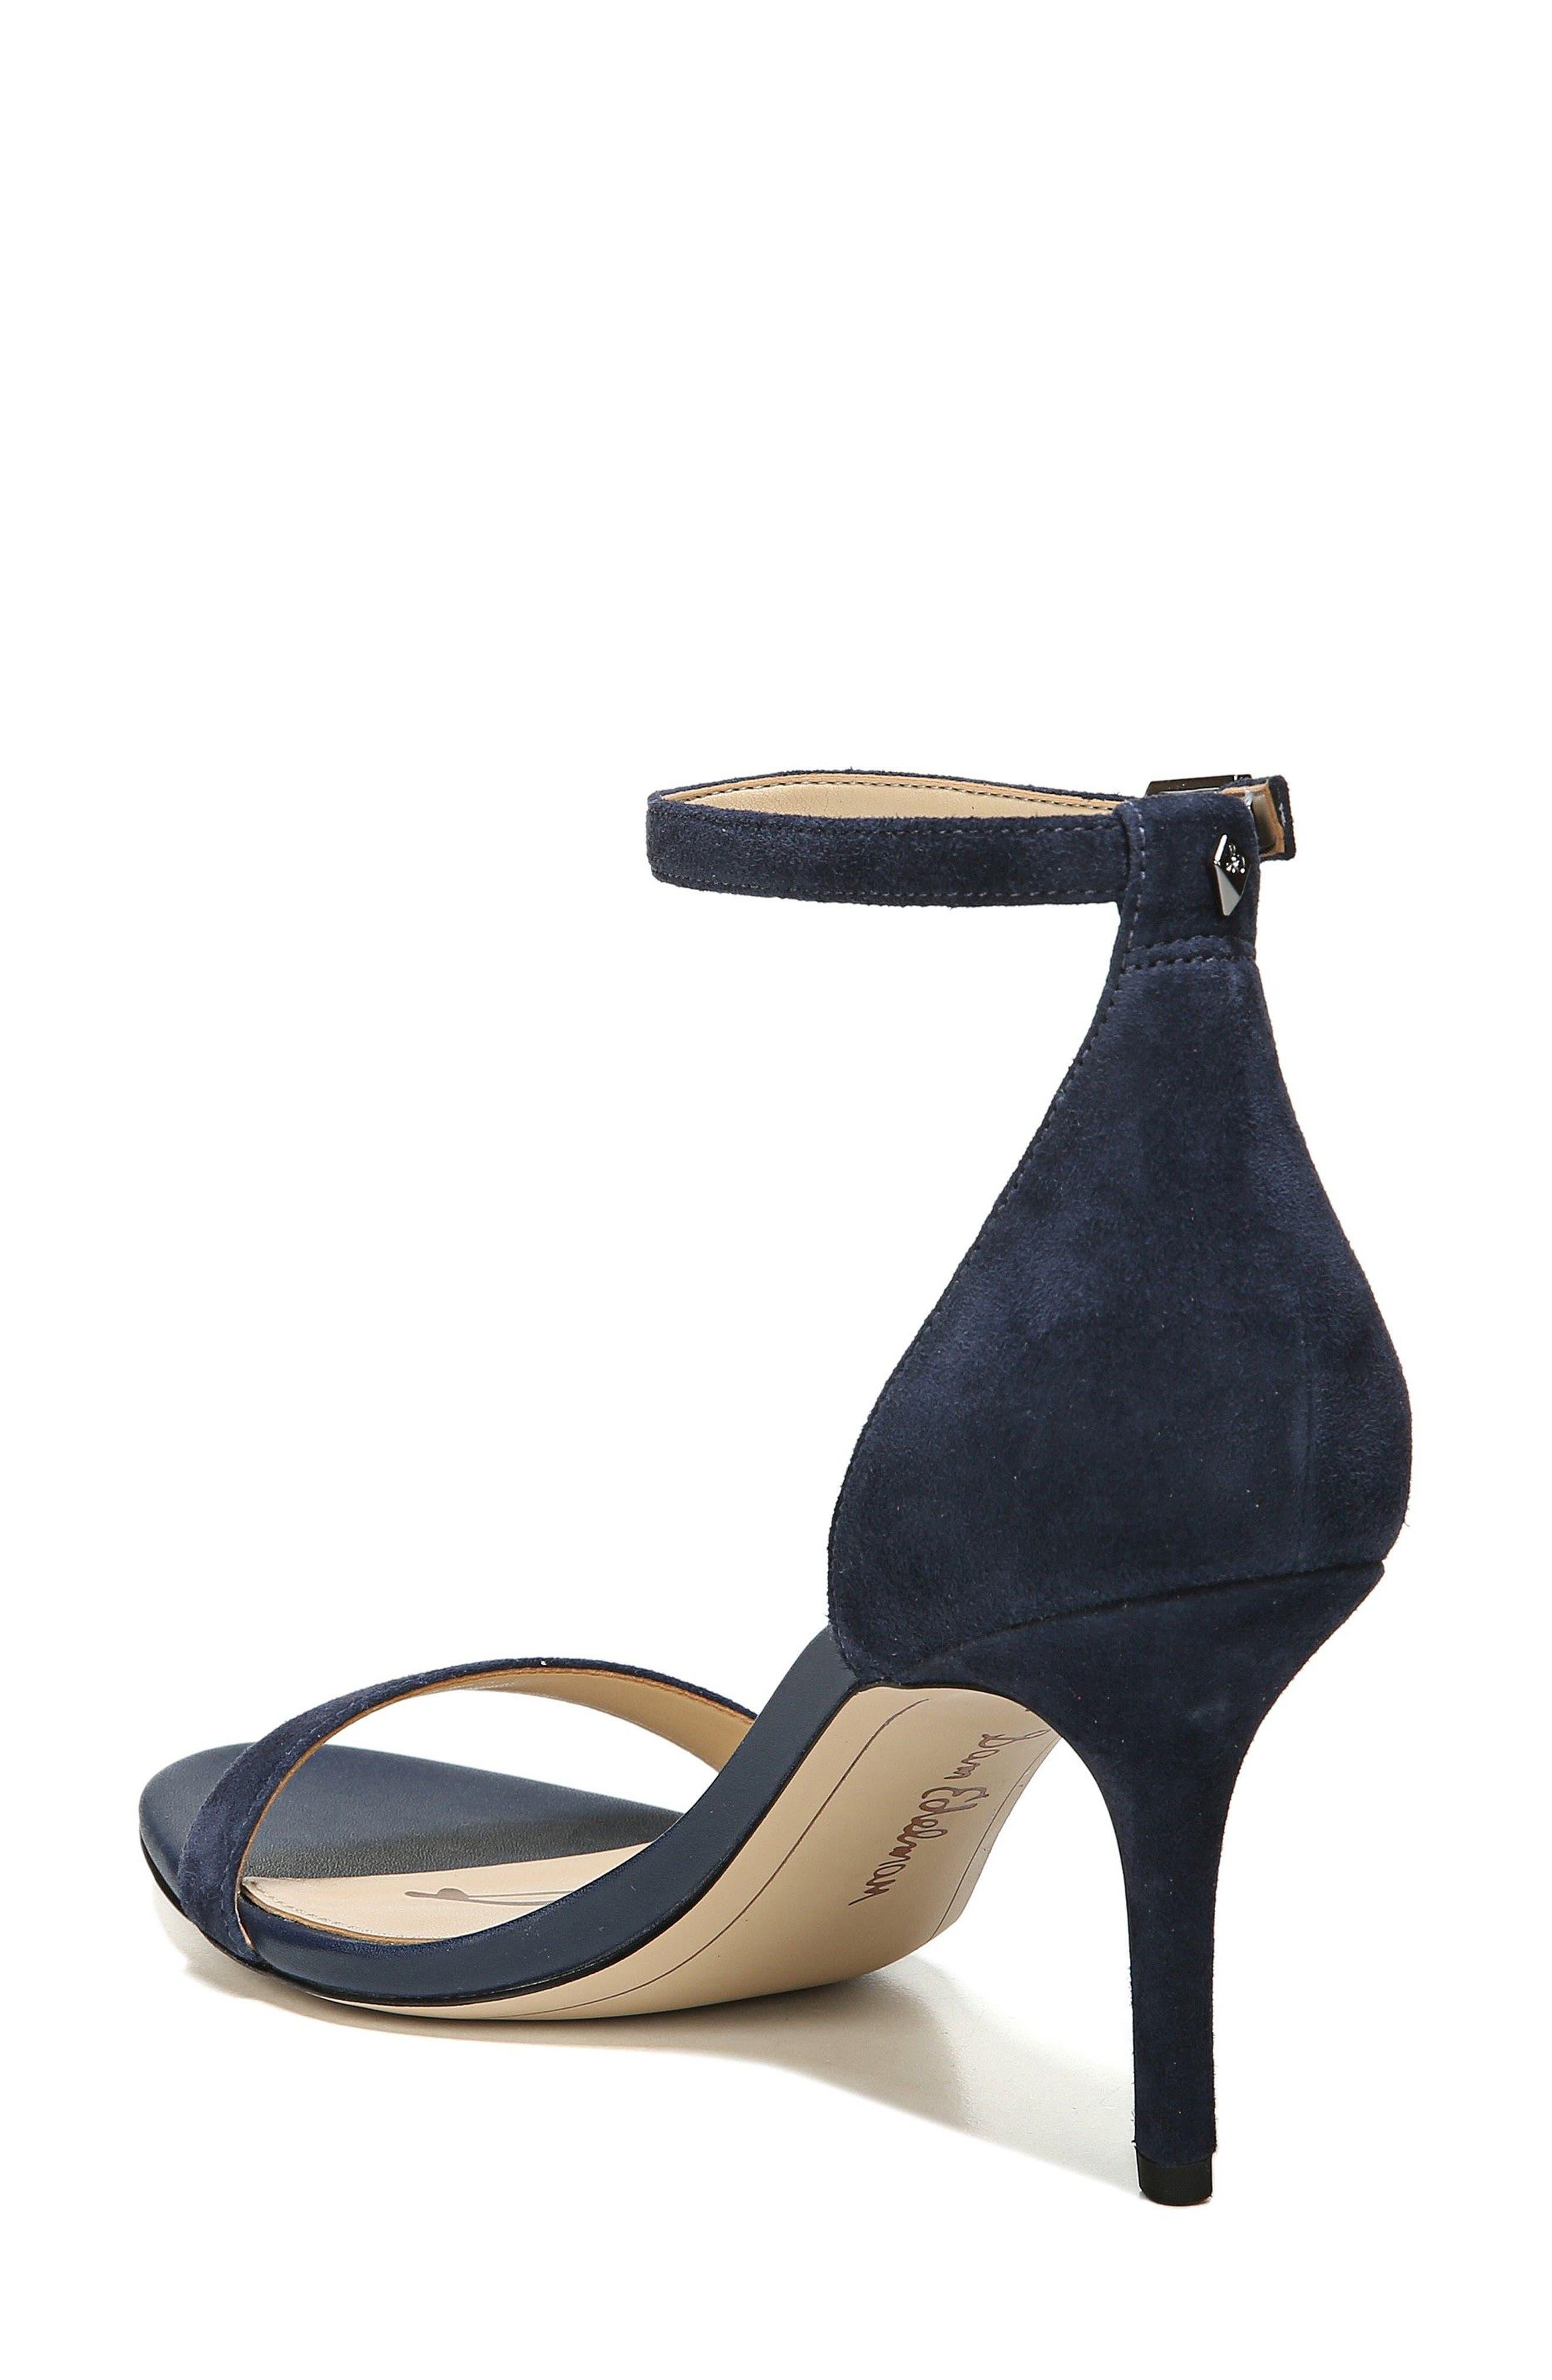 ,                             'Patti' Ankle Strap Sandal,                             Alternate thumbnail 199, color,                             407